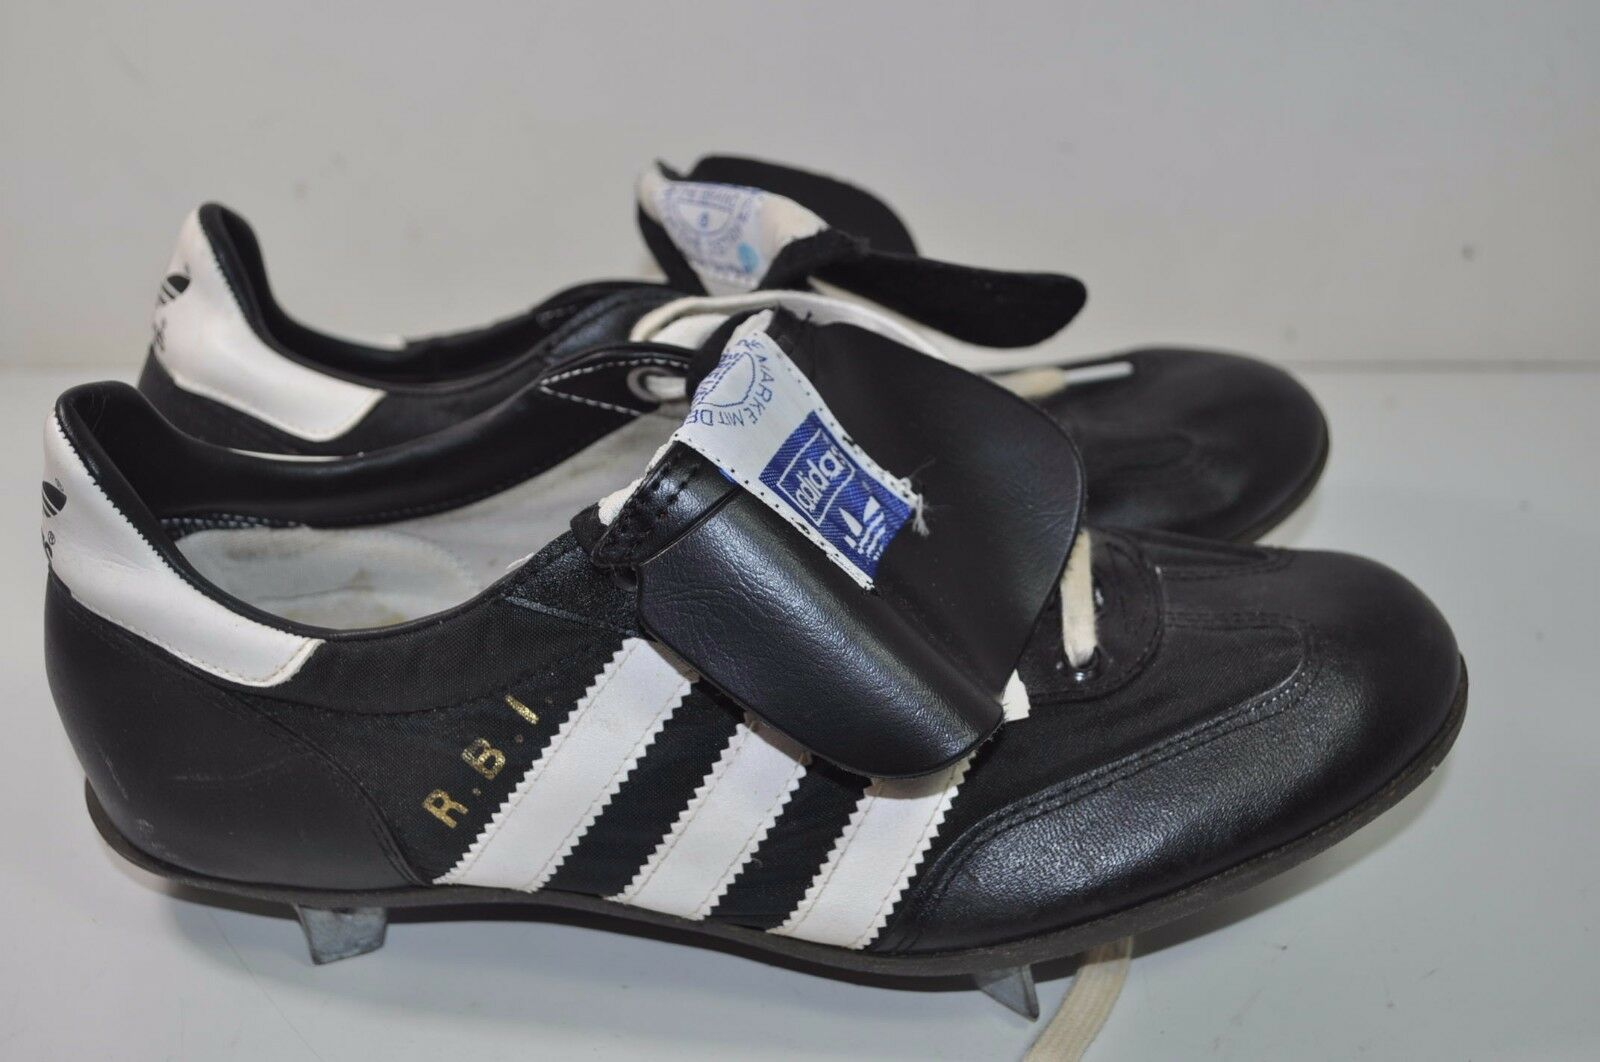 57a79e1e96b Adidas Vintage NOS Baseball Cleats shoes Size 6 1 2 - Taiwan R.B.I. ...